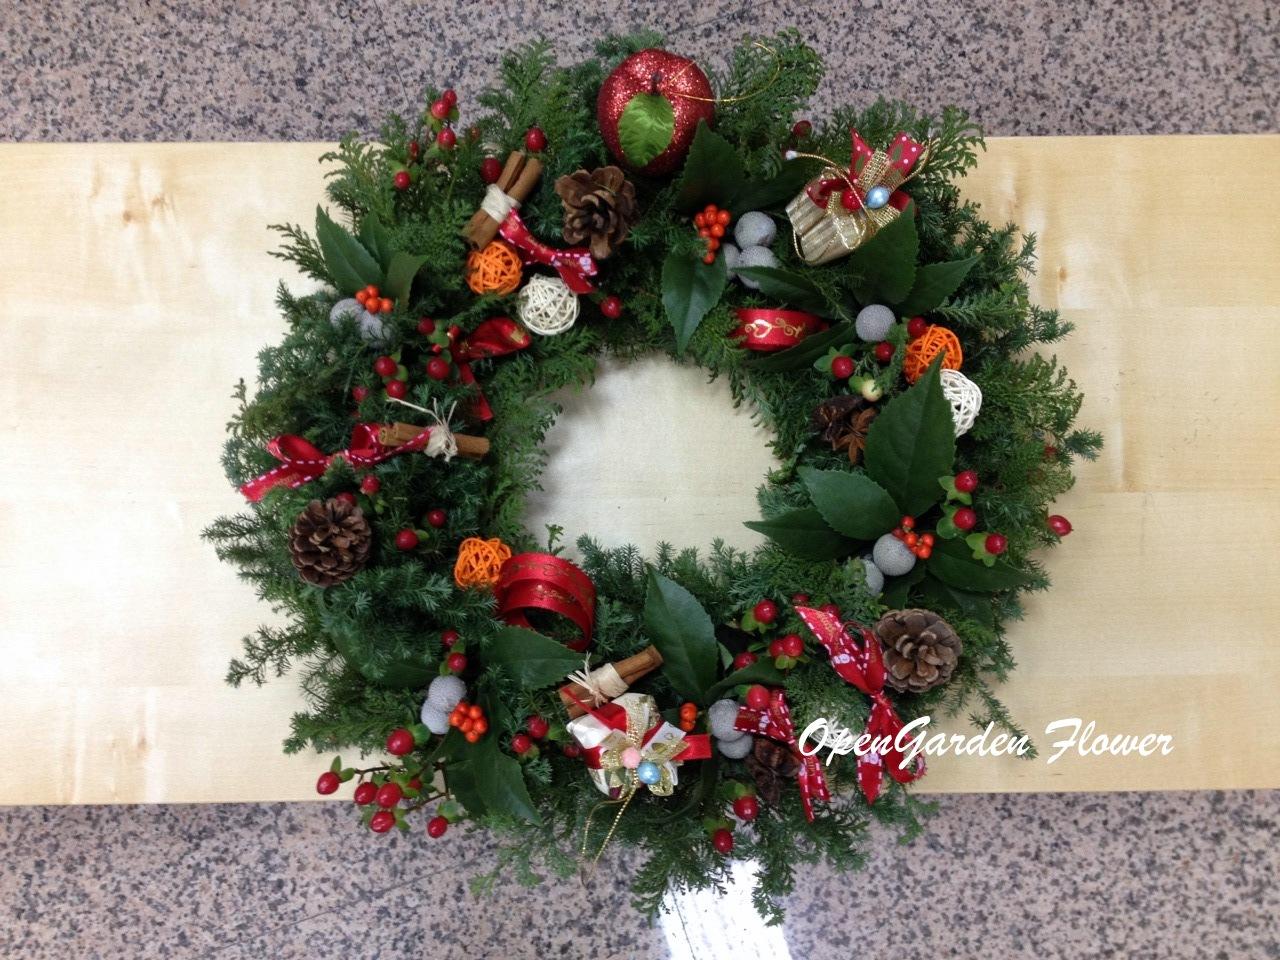 Open Garden: 歐式花藝教學 — 聖誕花環